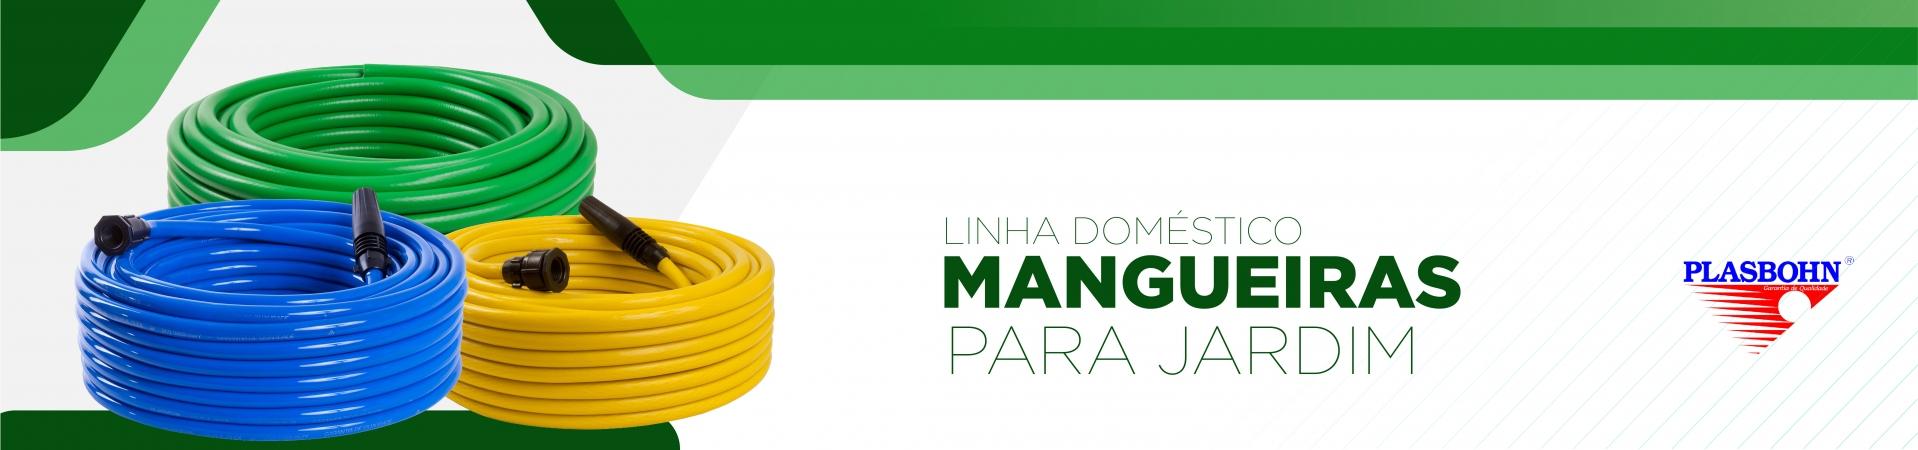 Plasbohn Maior Fabricante de Mangueiras no Brasil - Top Of Mind